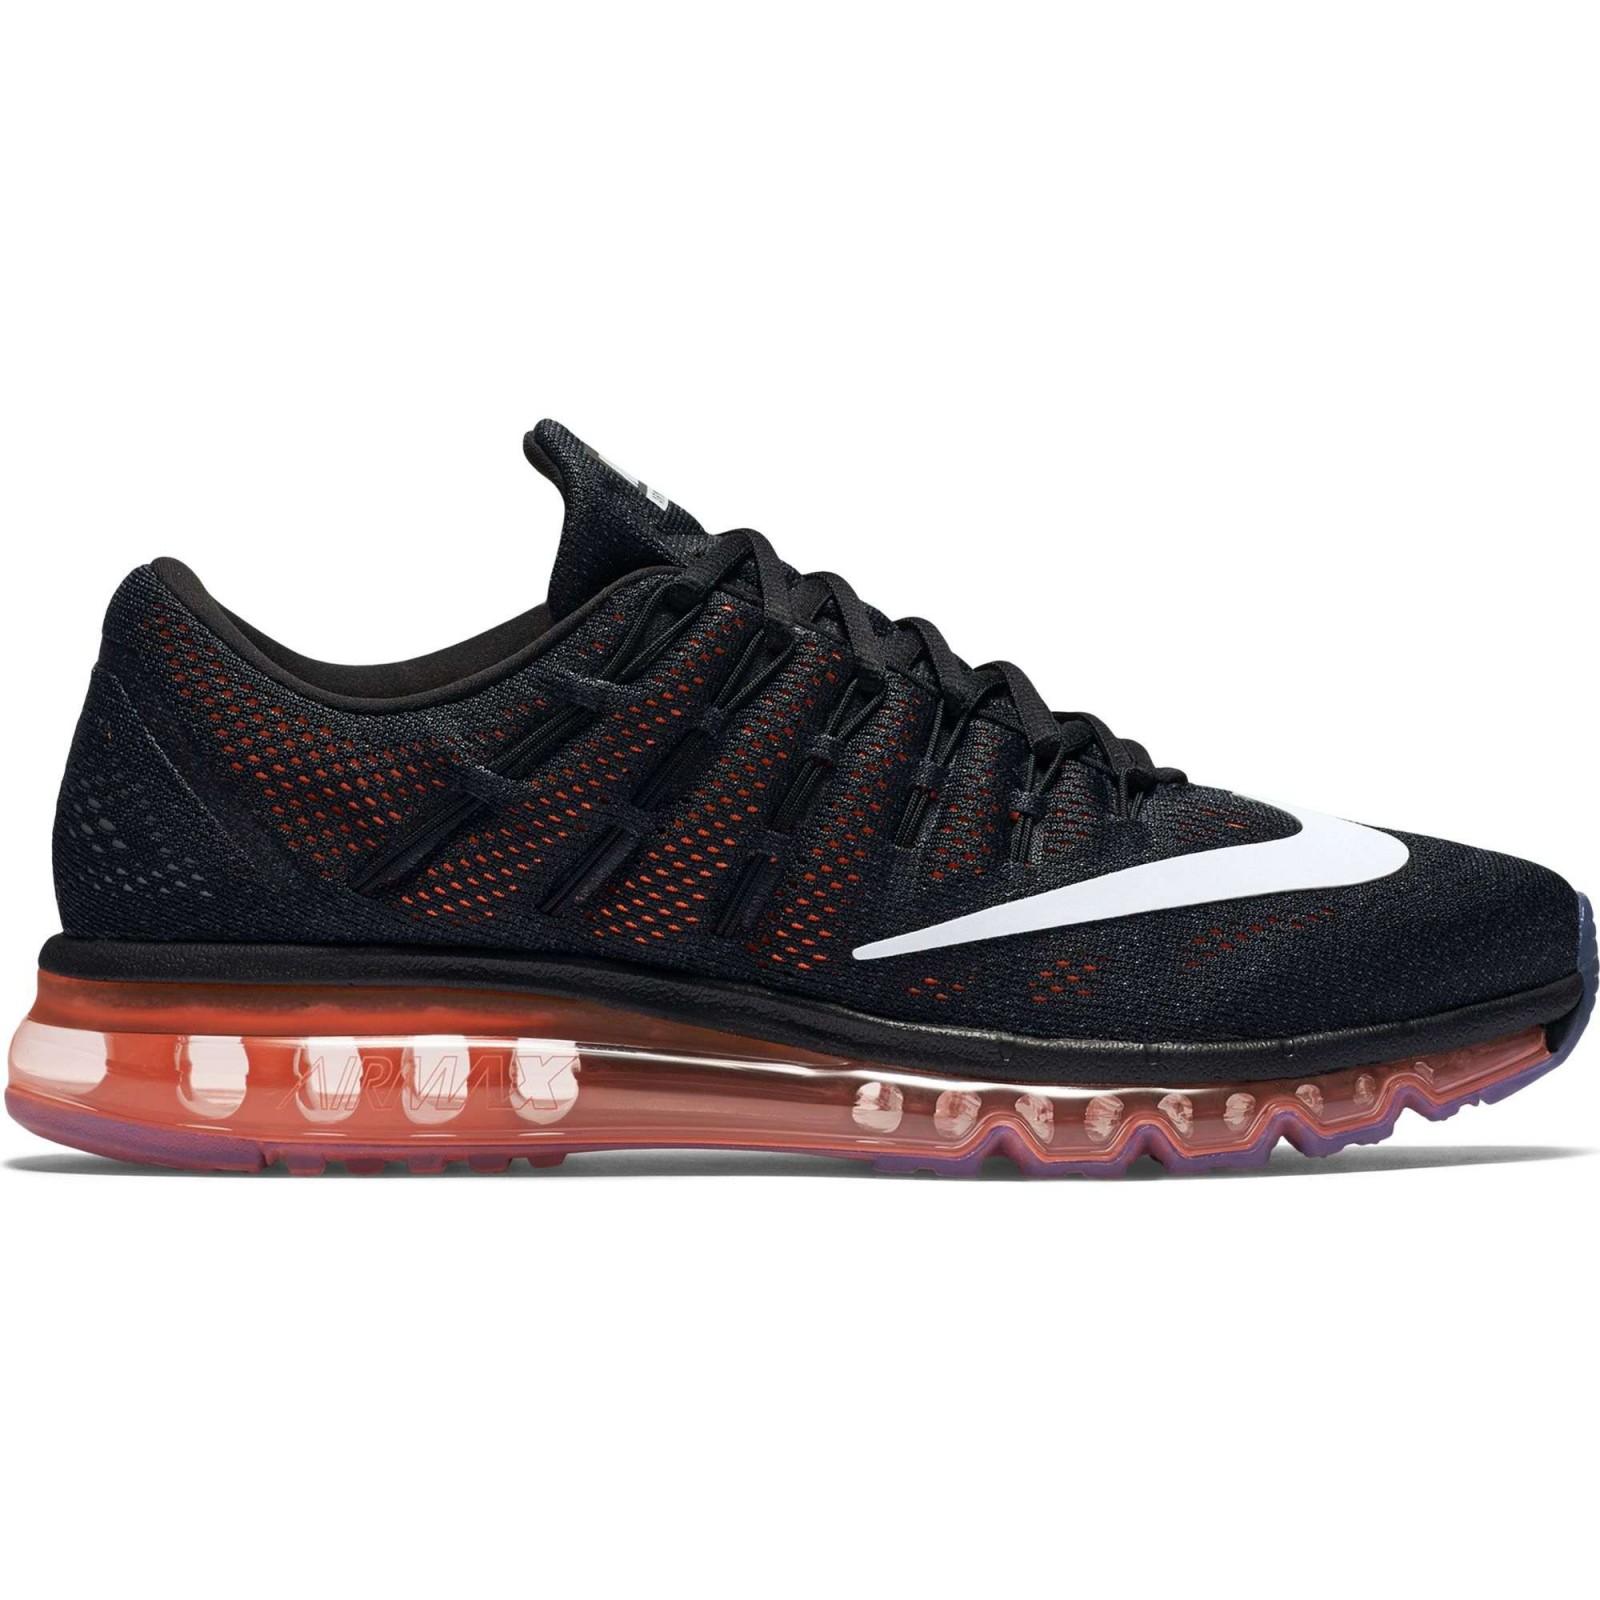 29b73018c56 Pánské boty Nike AIR MAX 2016 černé